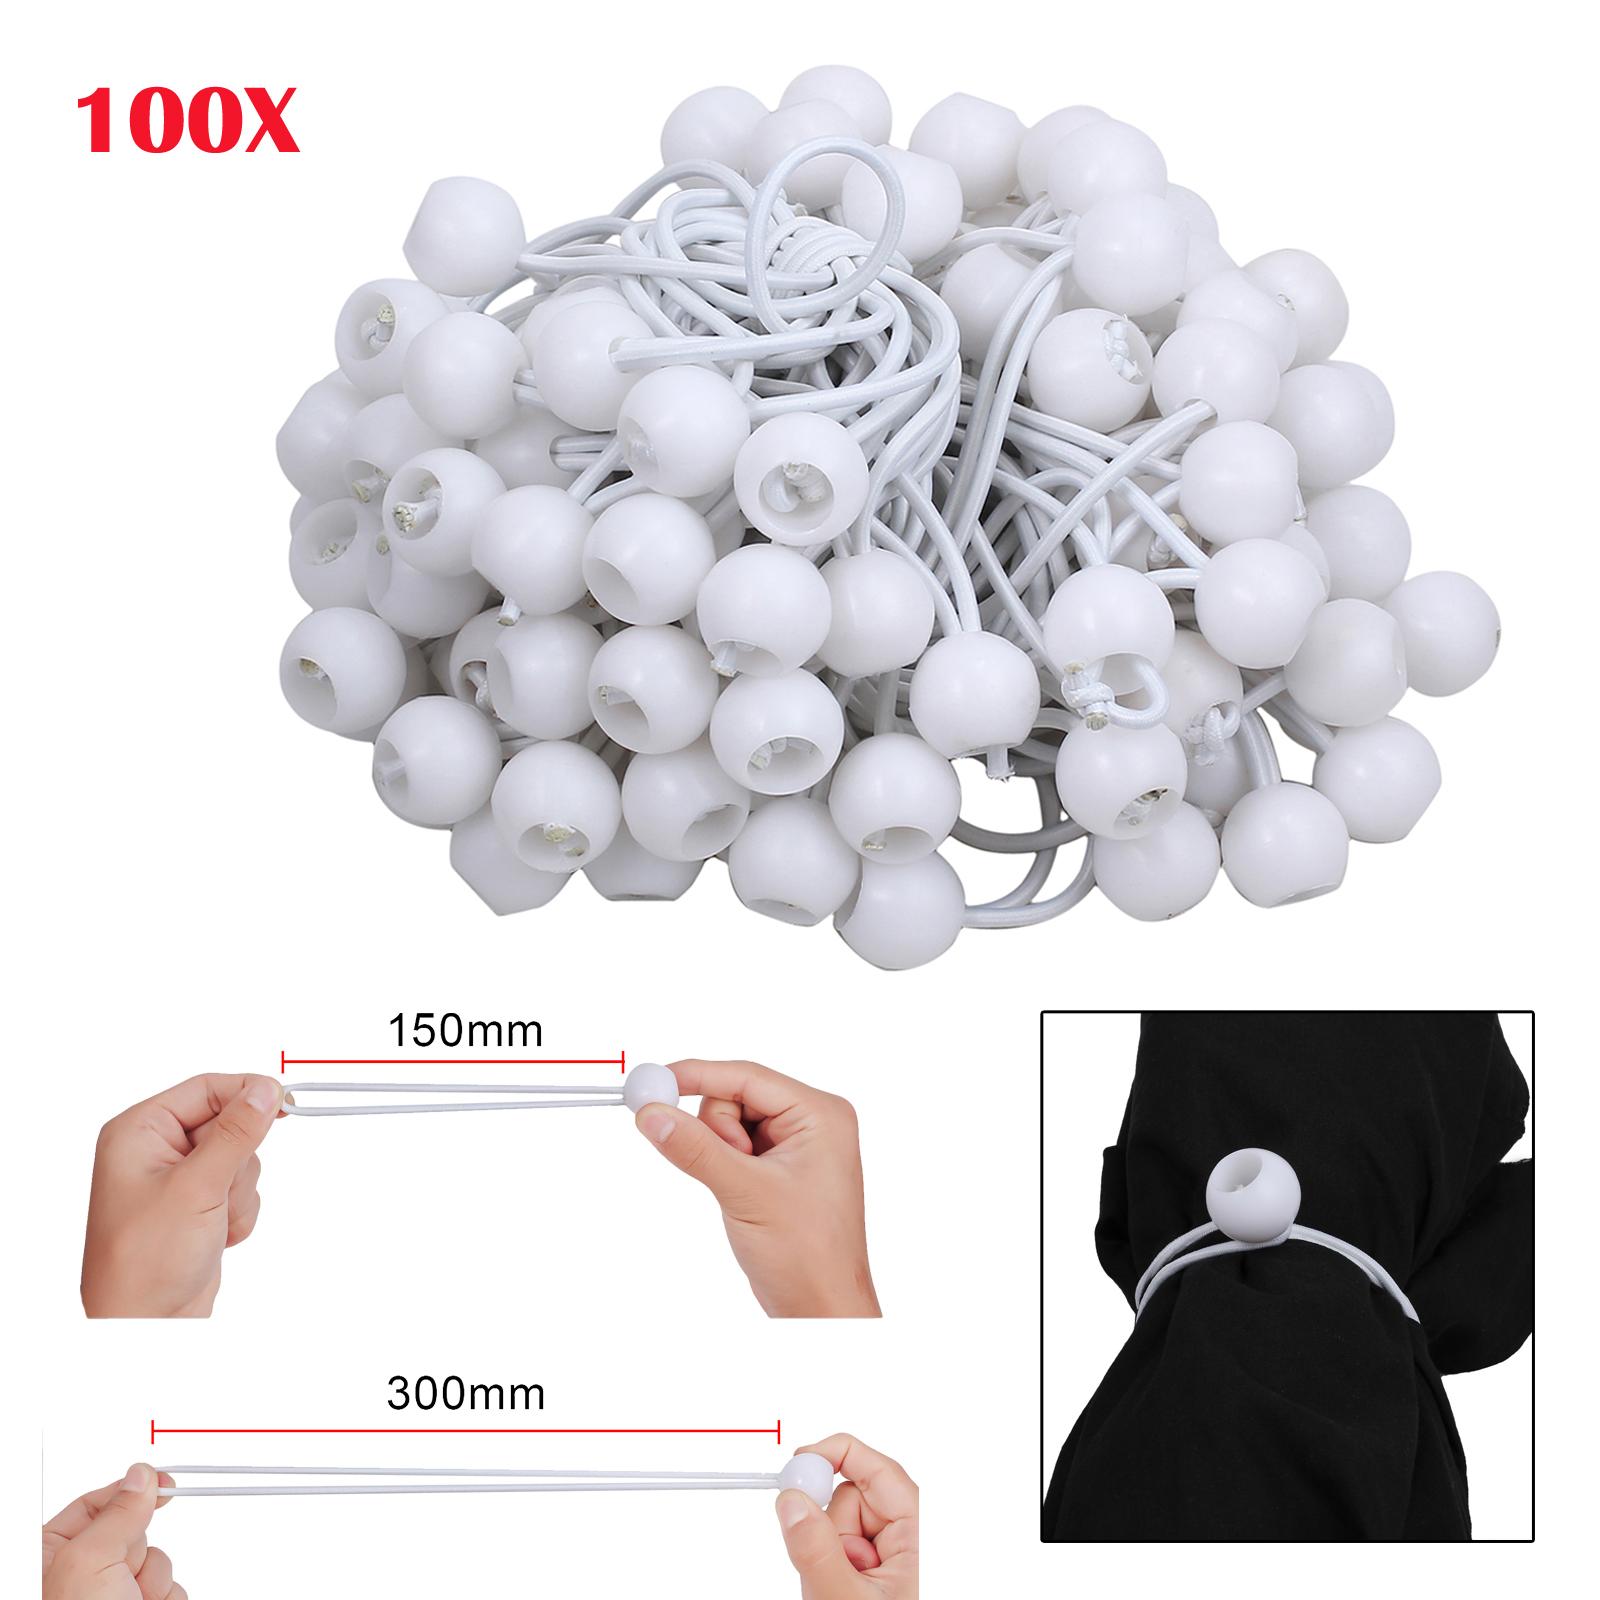 white 4 x 300mm 100 x Ball Bungee Cord Tarp Canopy Tie Down Strap